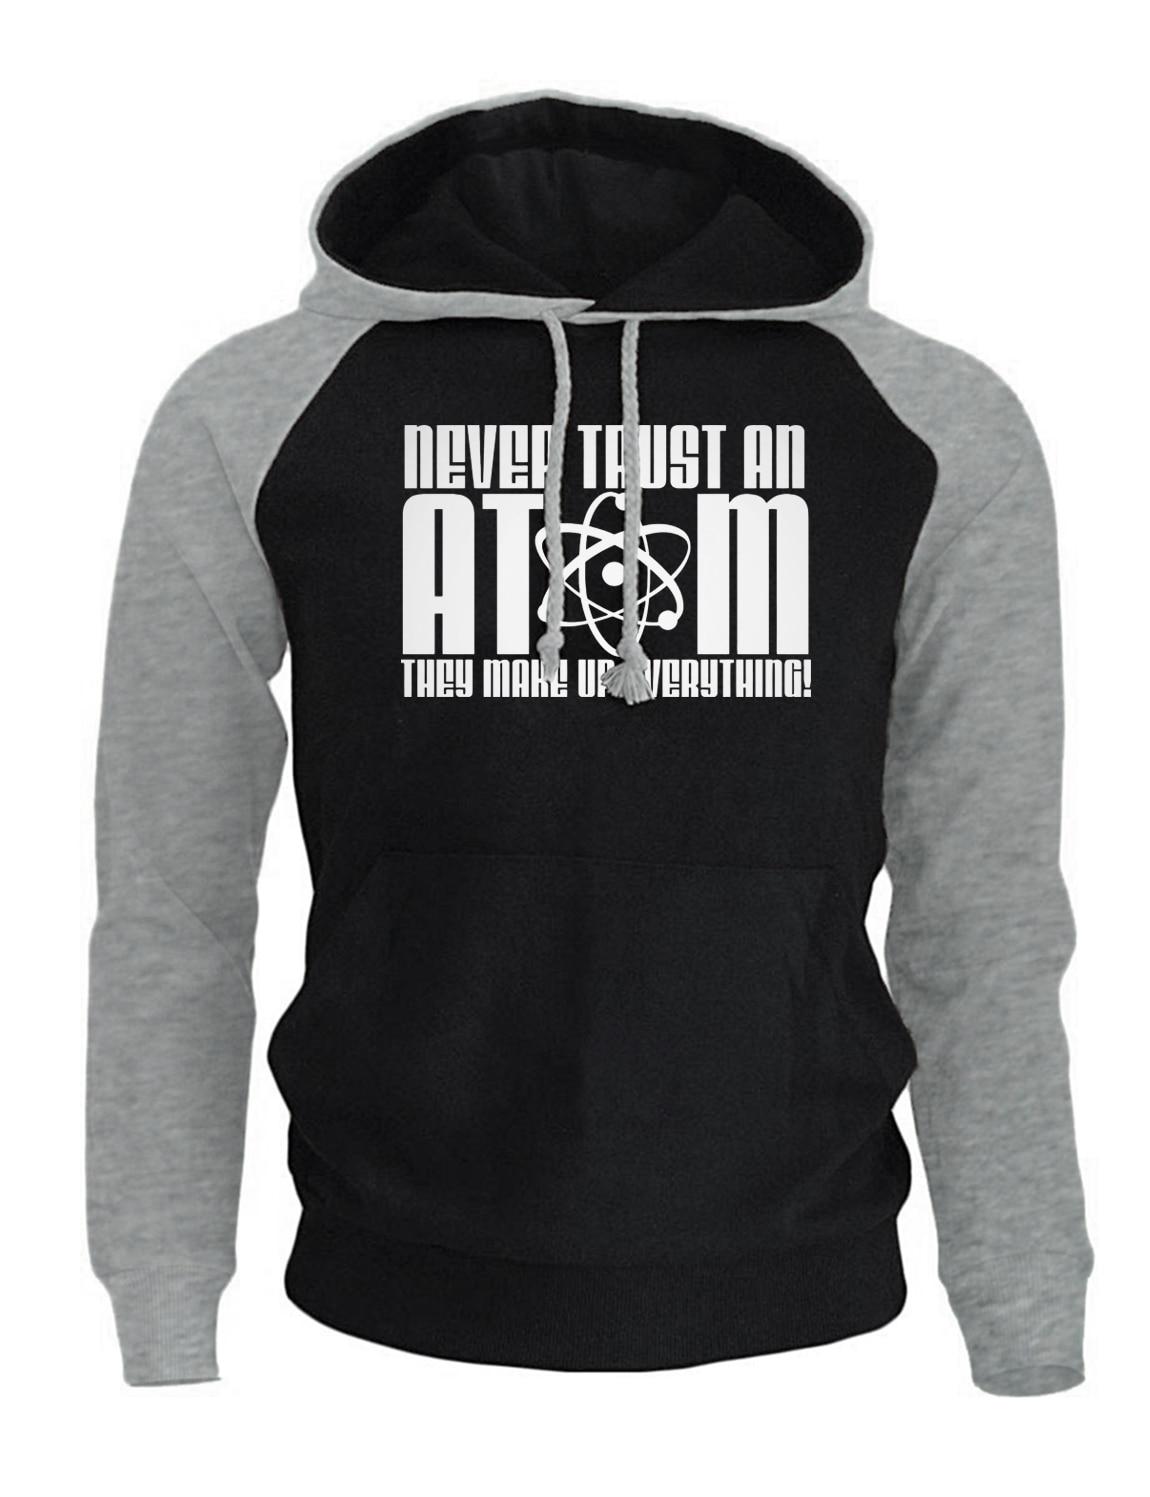 NEVER TRUST AN ATOM Funny Print Hoodies 2018 Autumn Winter Raglan Sweatshirts Casual Men's Sportsuit Harajuku Hoody Men Brand